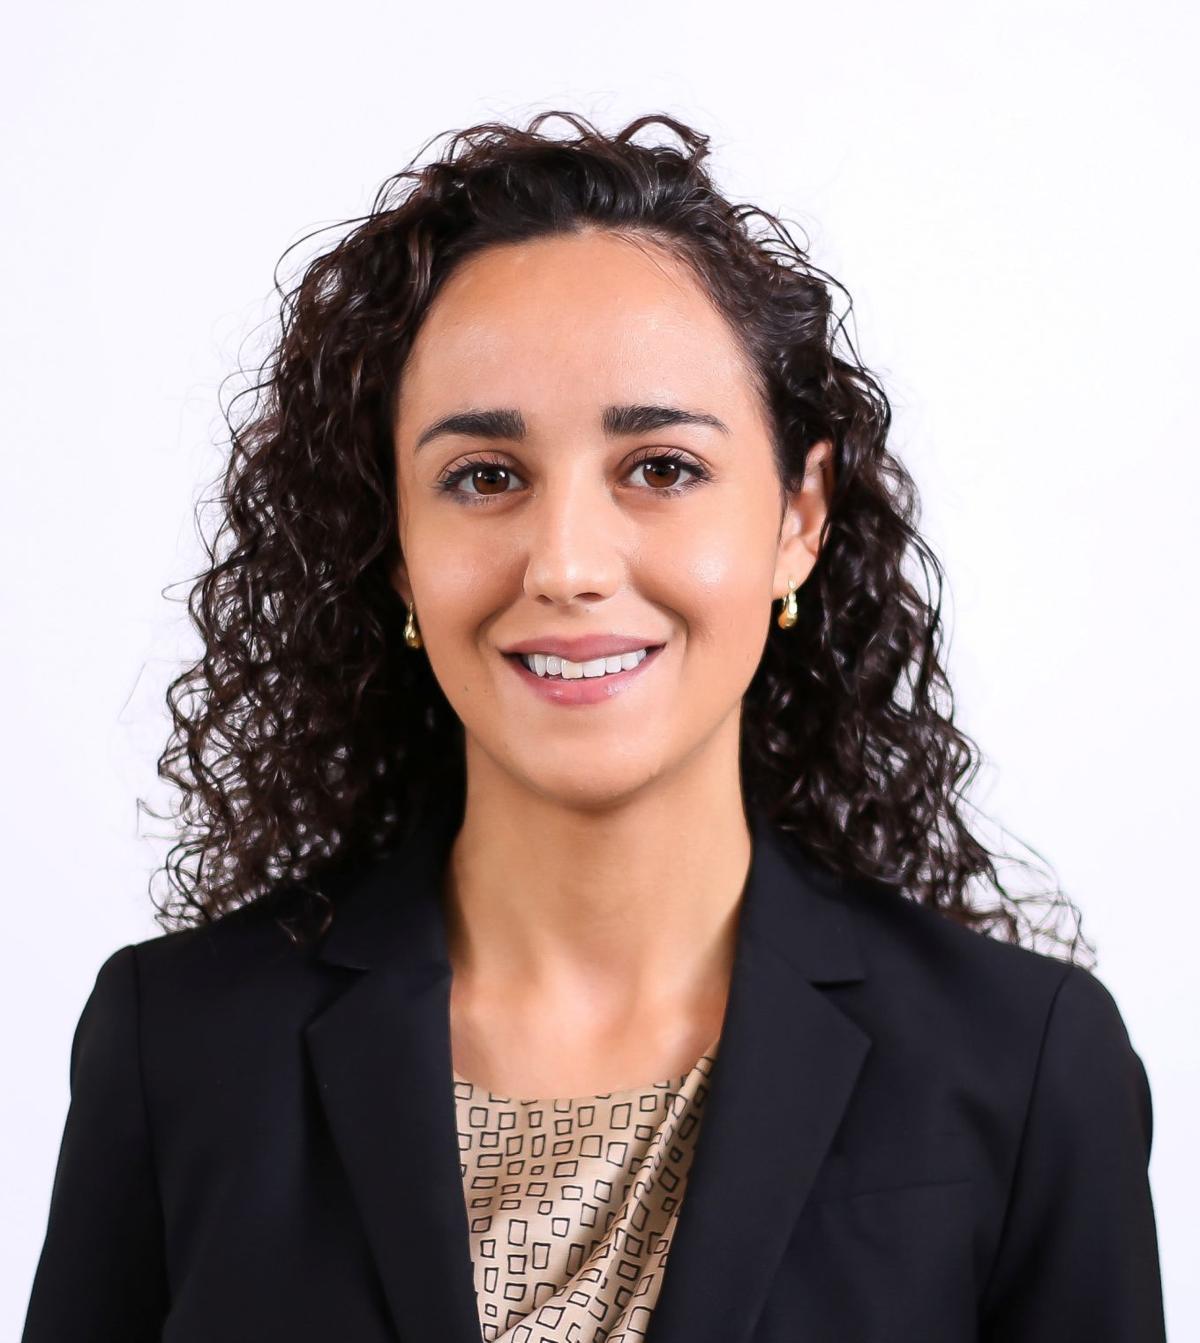 Maryam Ghayyad